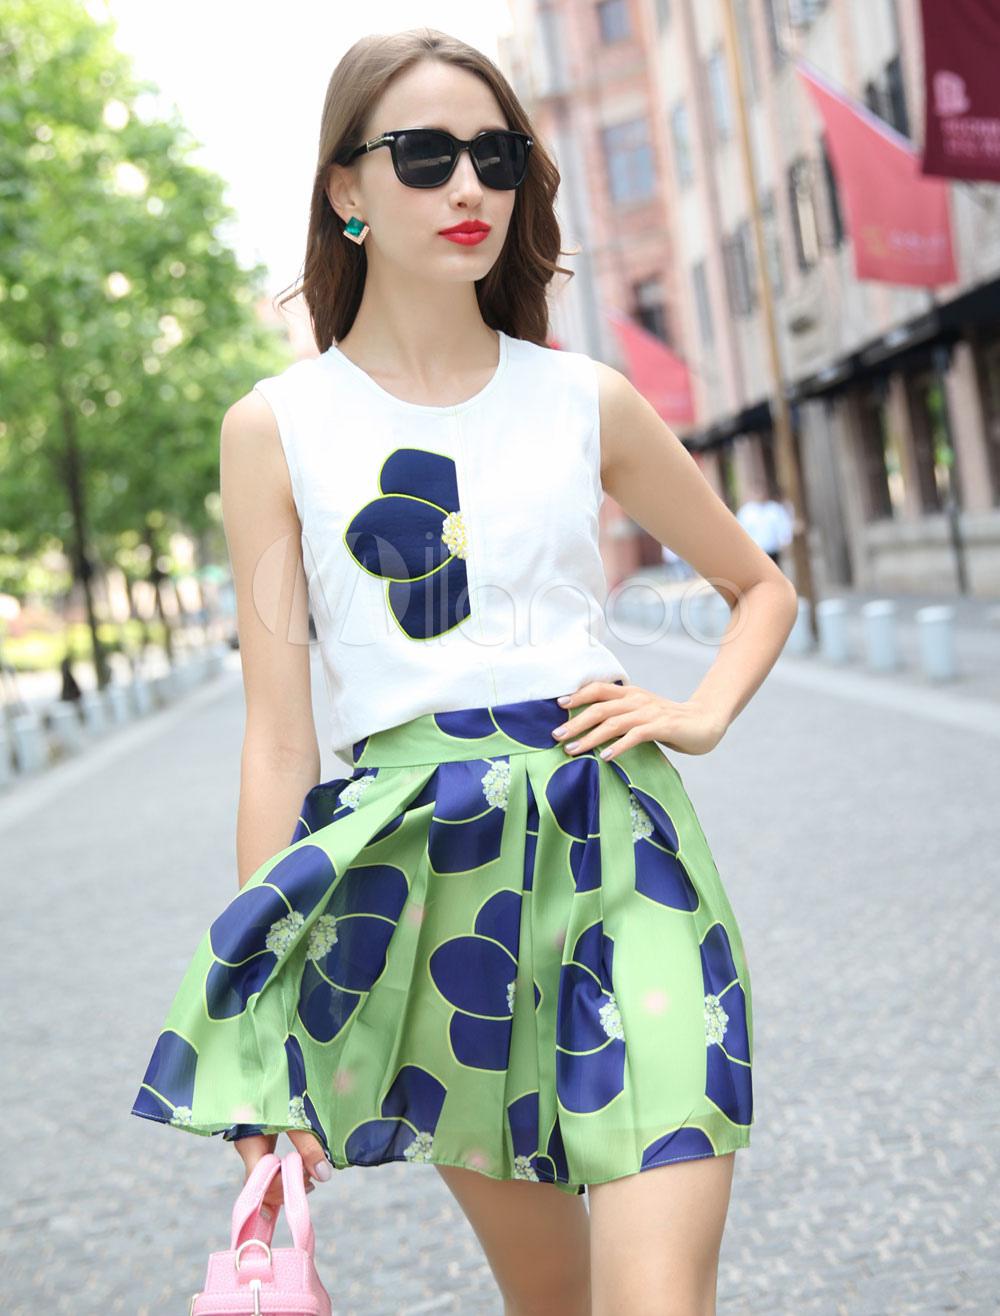 White Print Chiffon Top and Skirt for Women